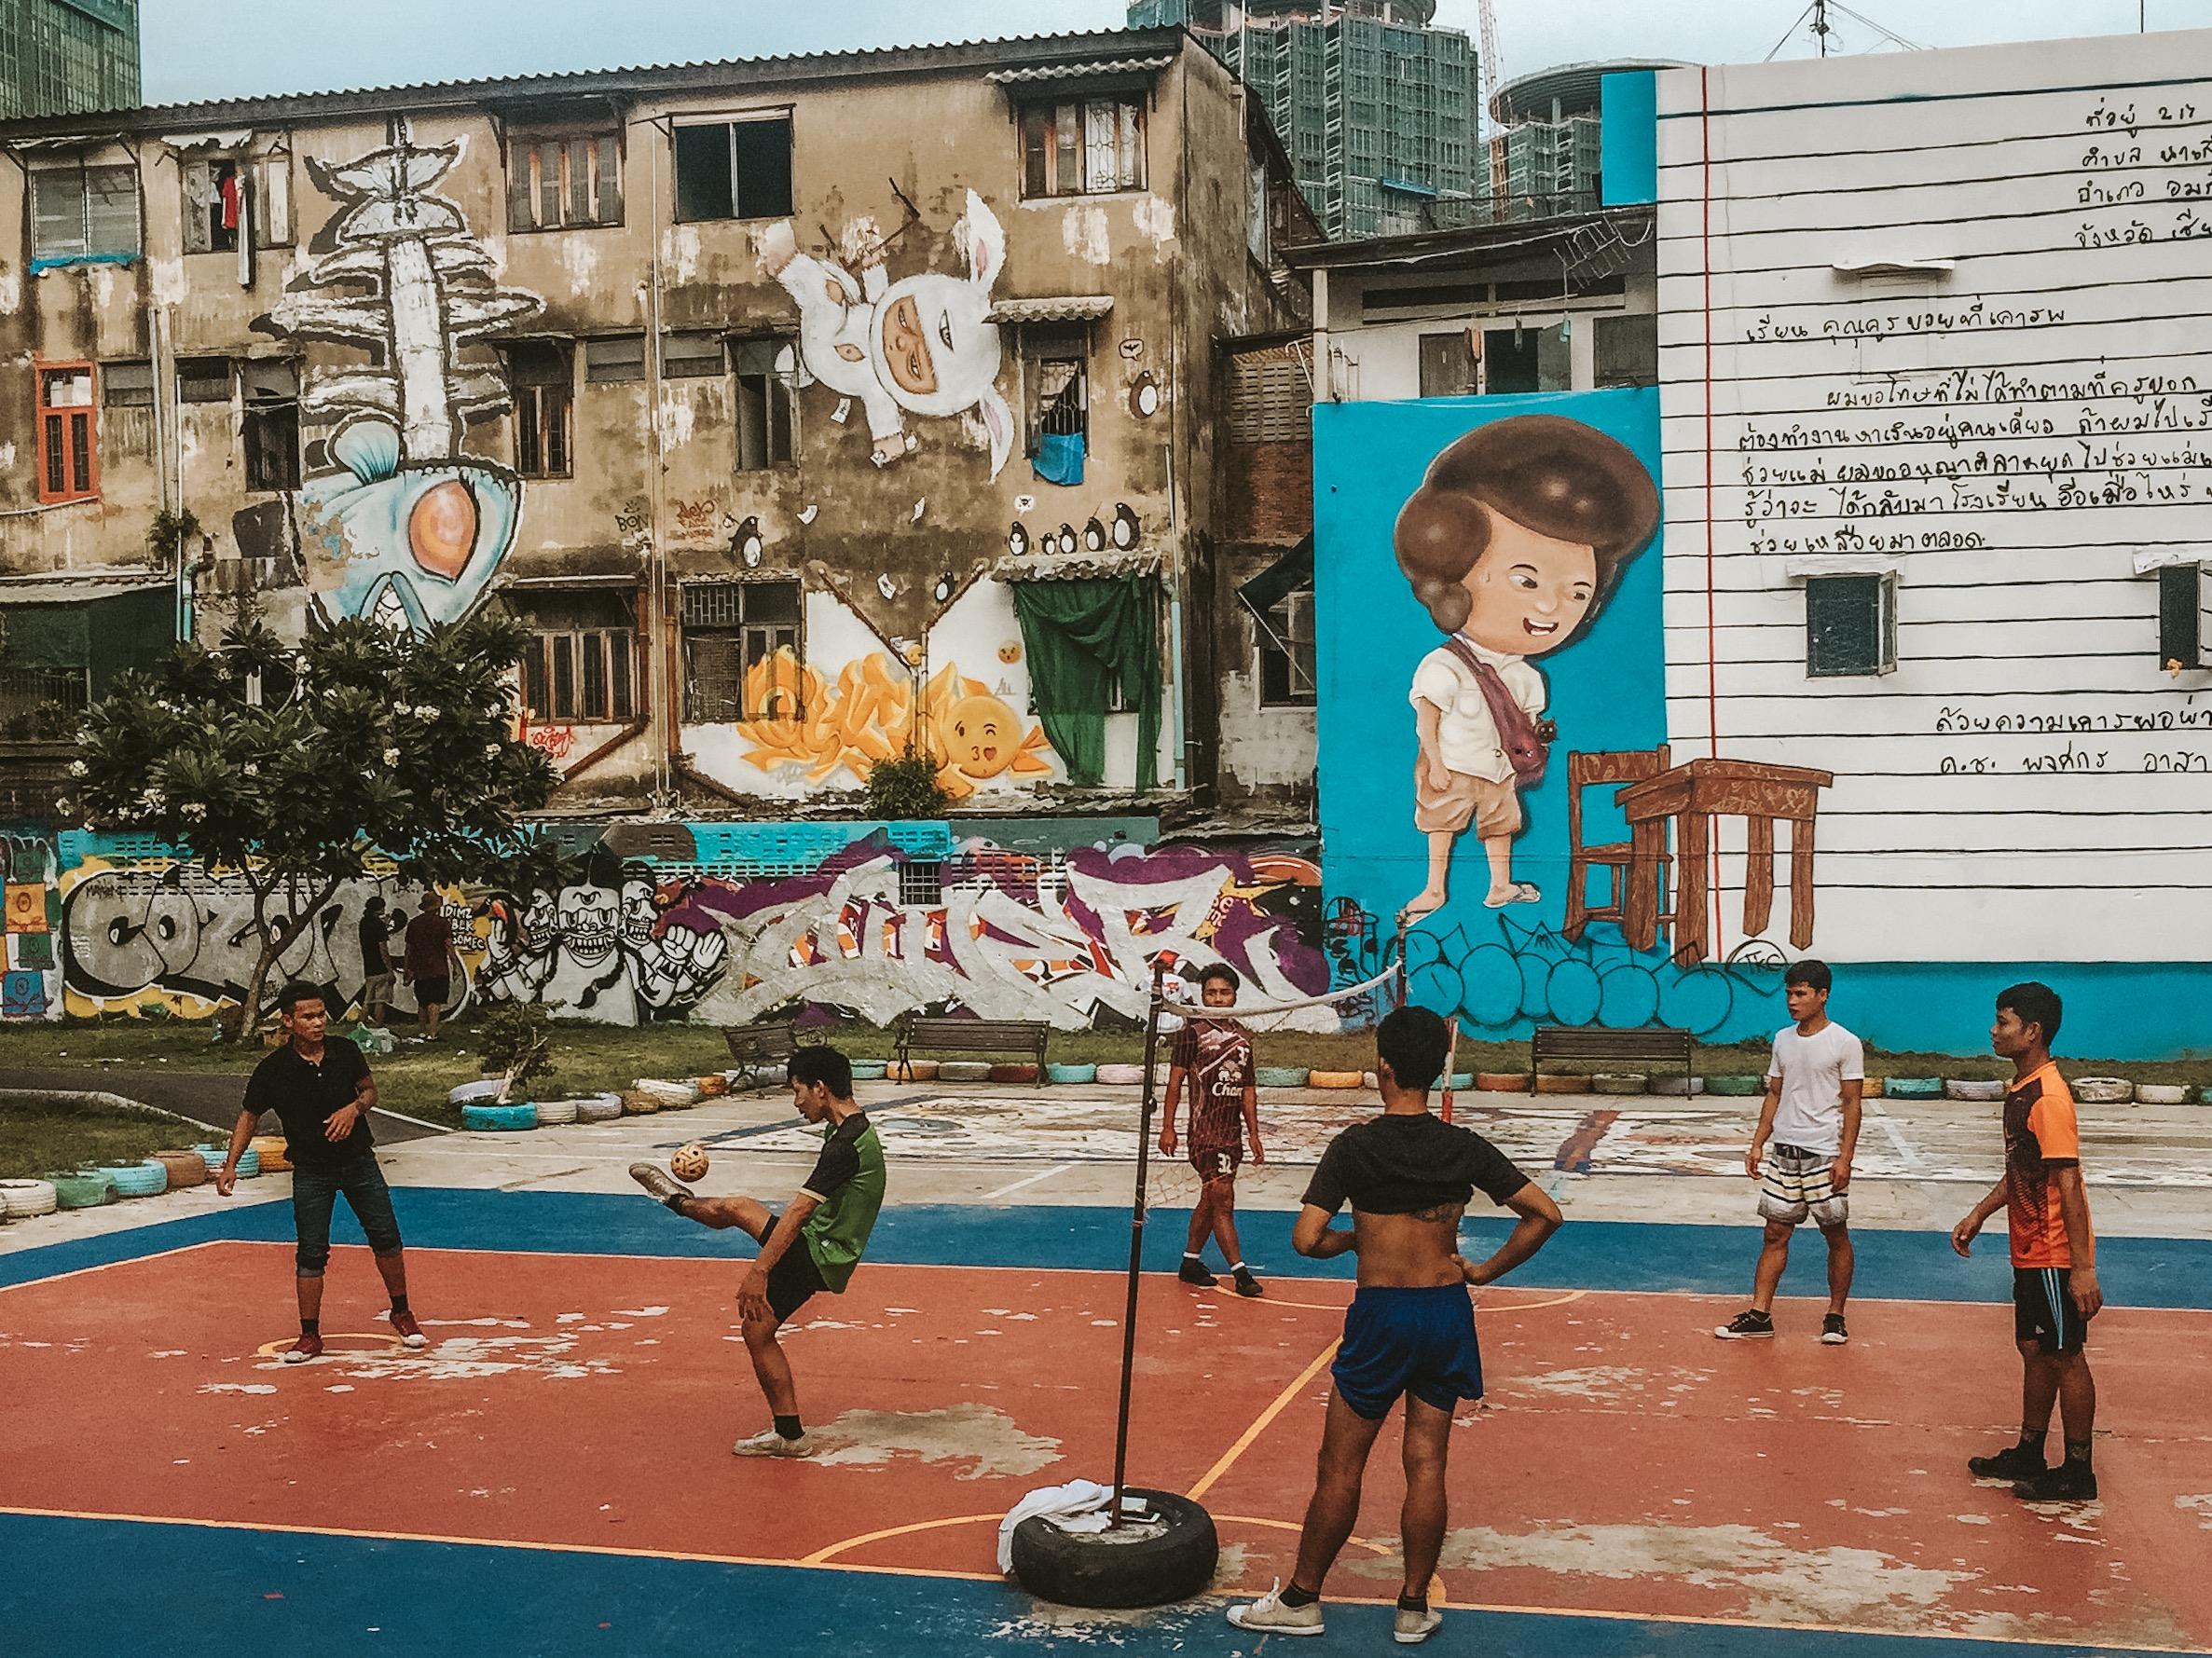 Chalermla Park / Graffiti Park